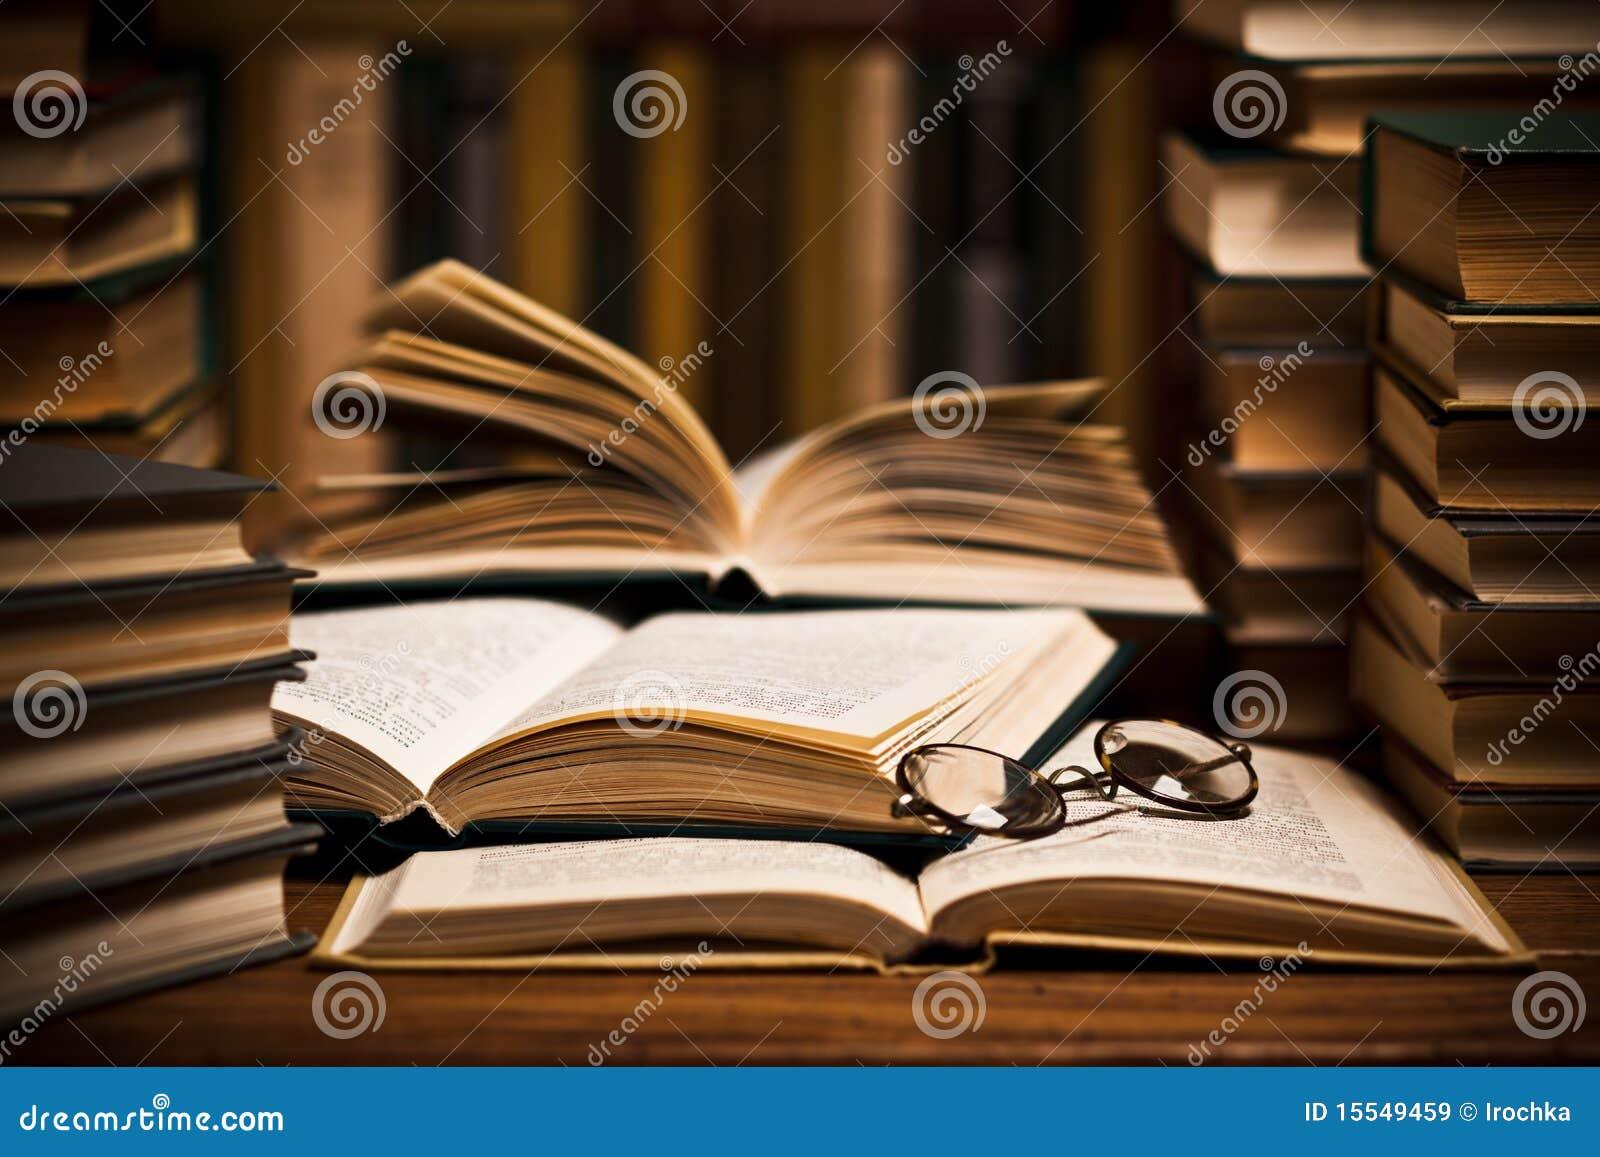 Download ανάγνωση βιβλίων στοκ εικόνα. εικόνα από στοίβα, αναφορά - 15549459